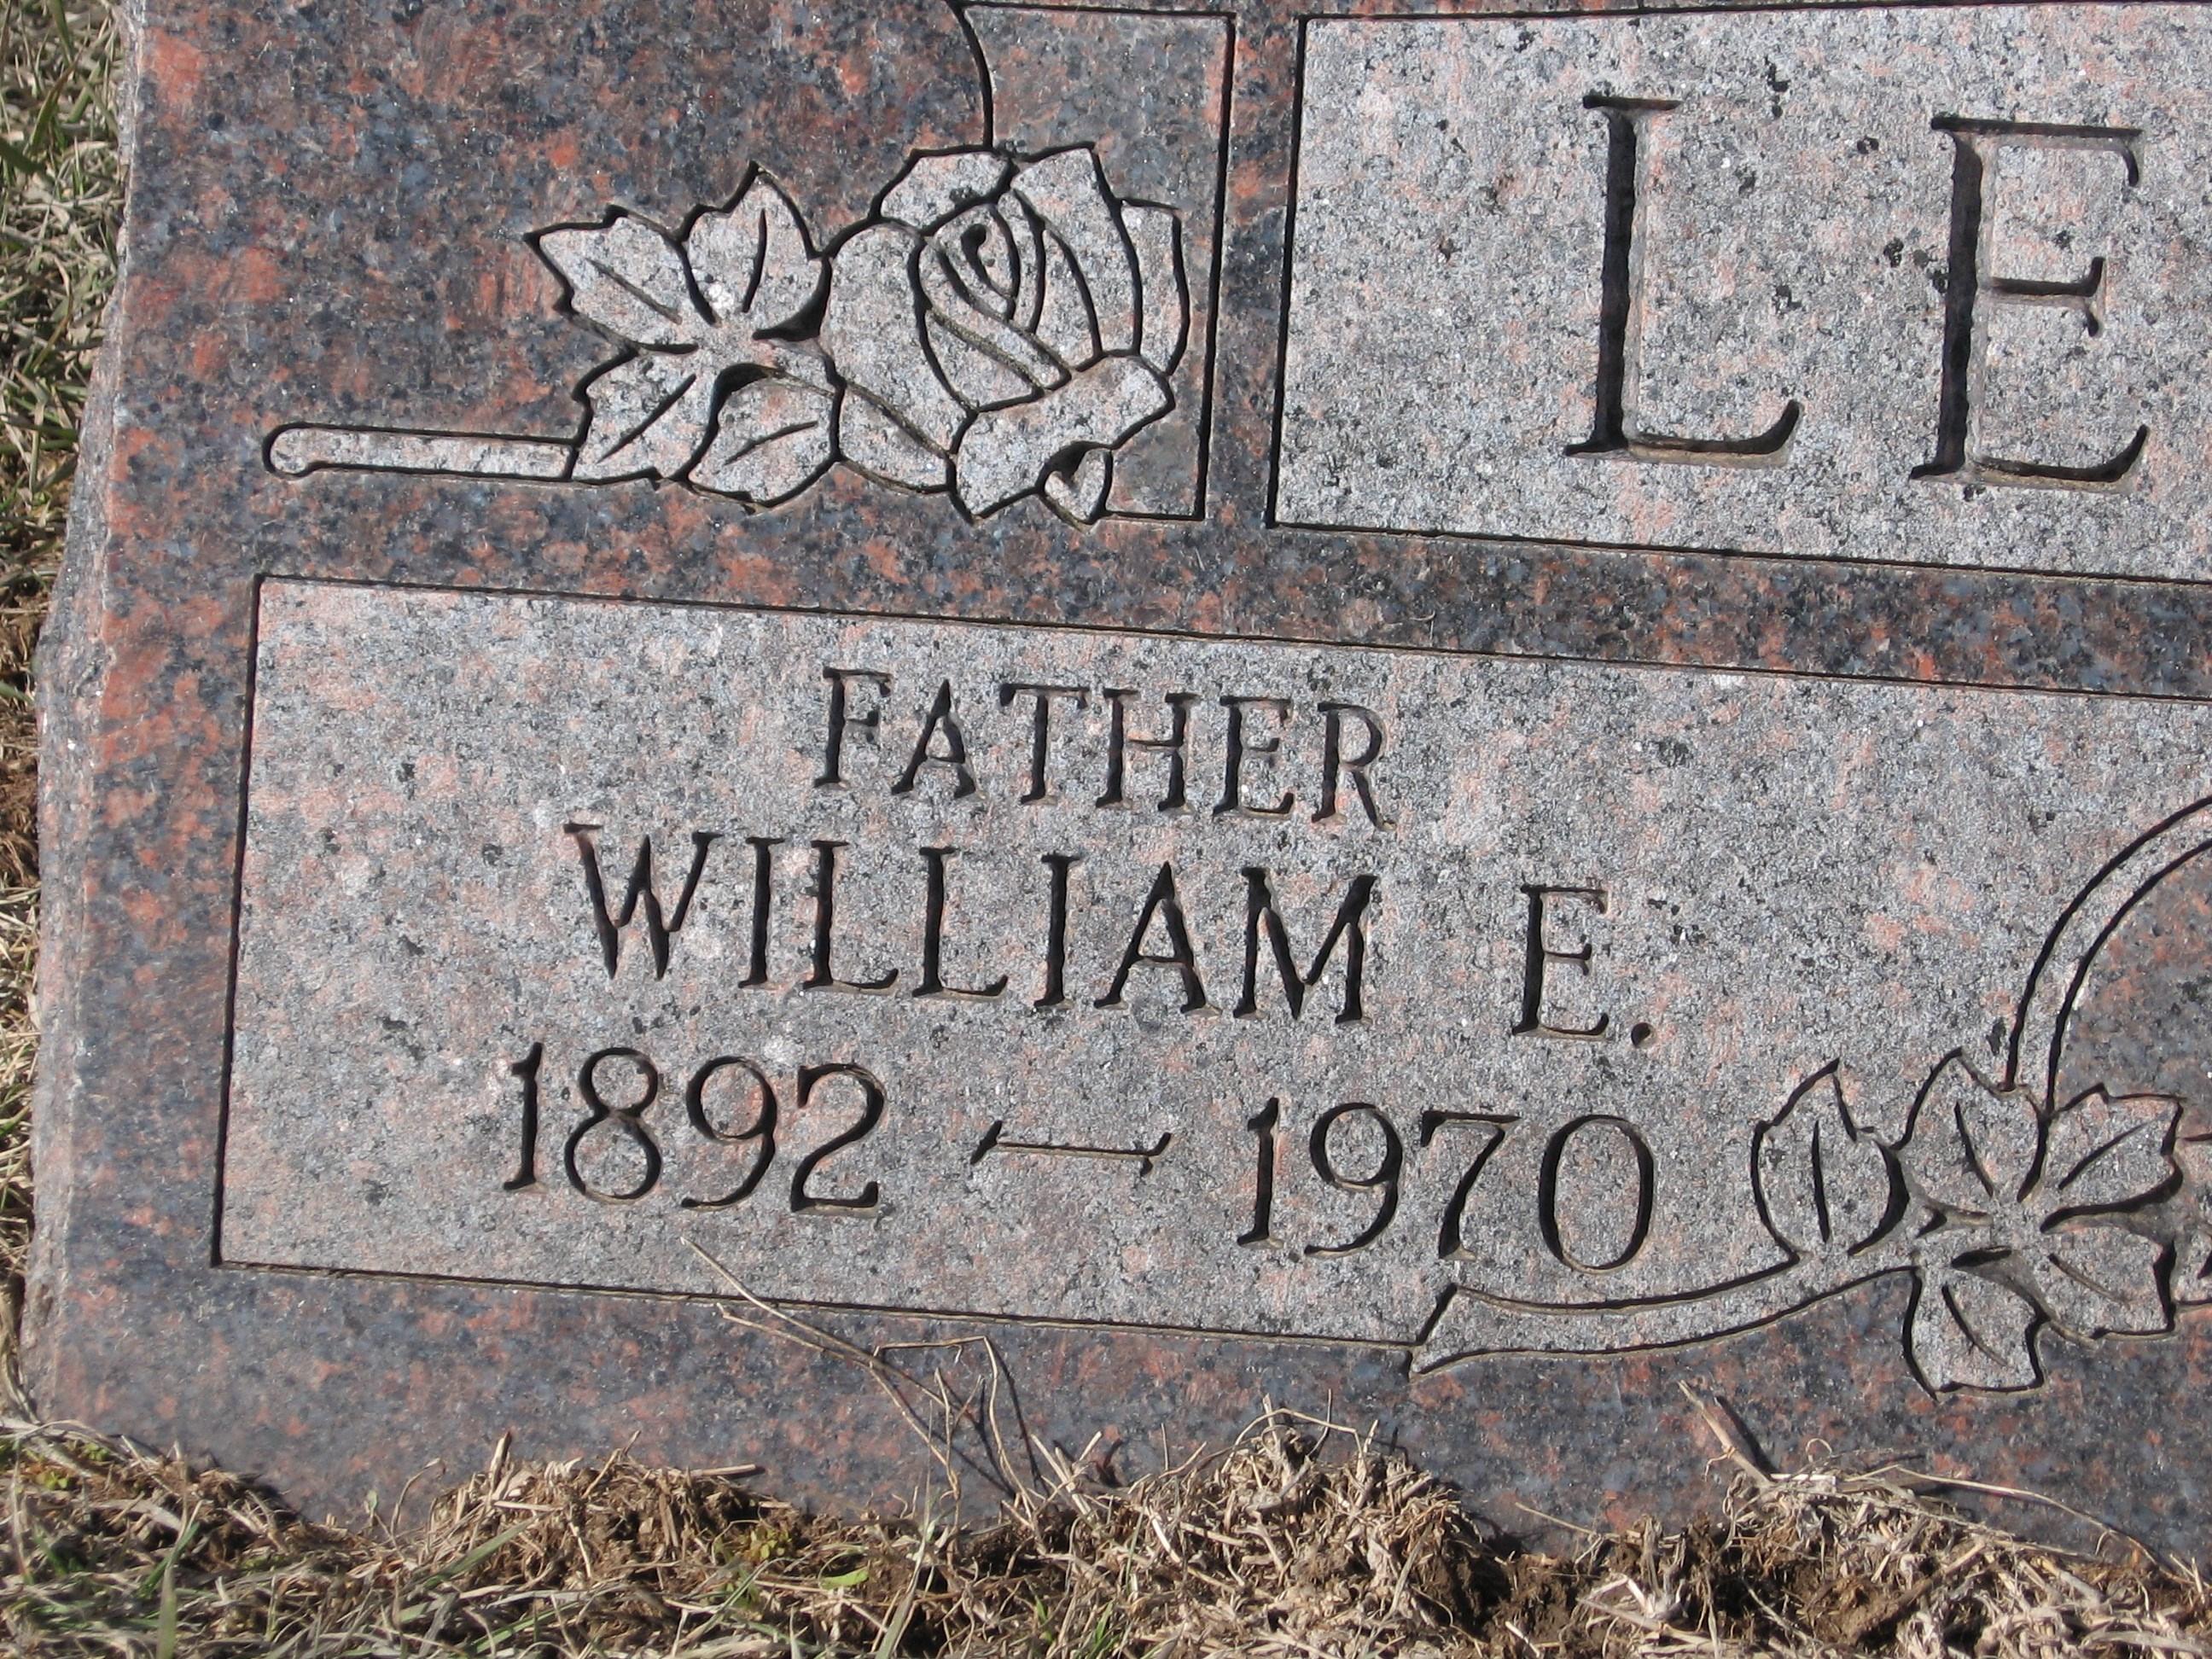 William Edward Lewis